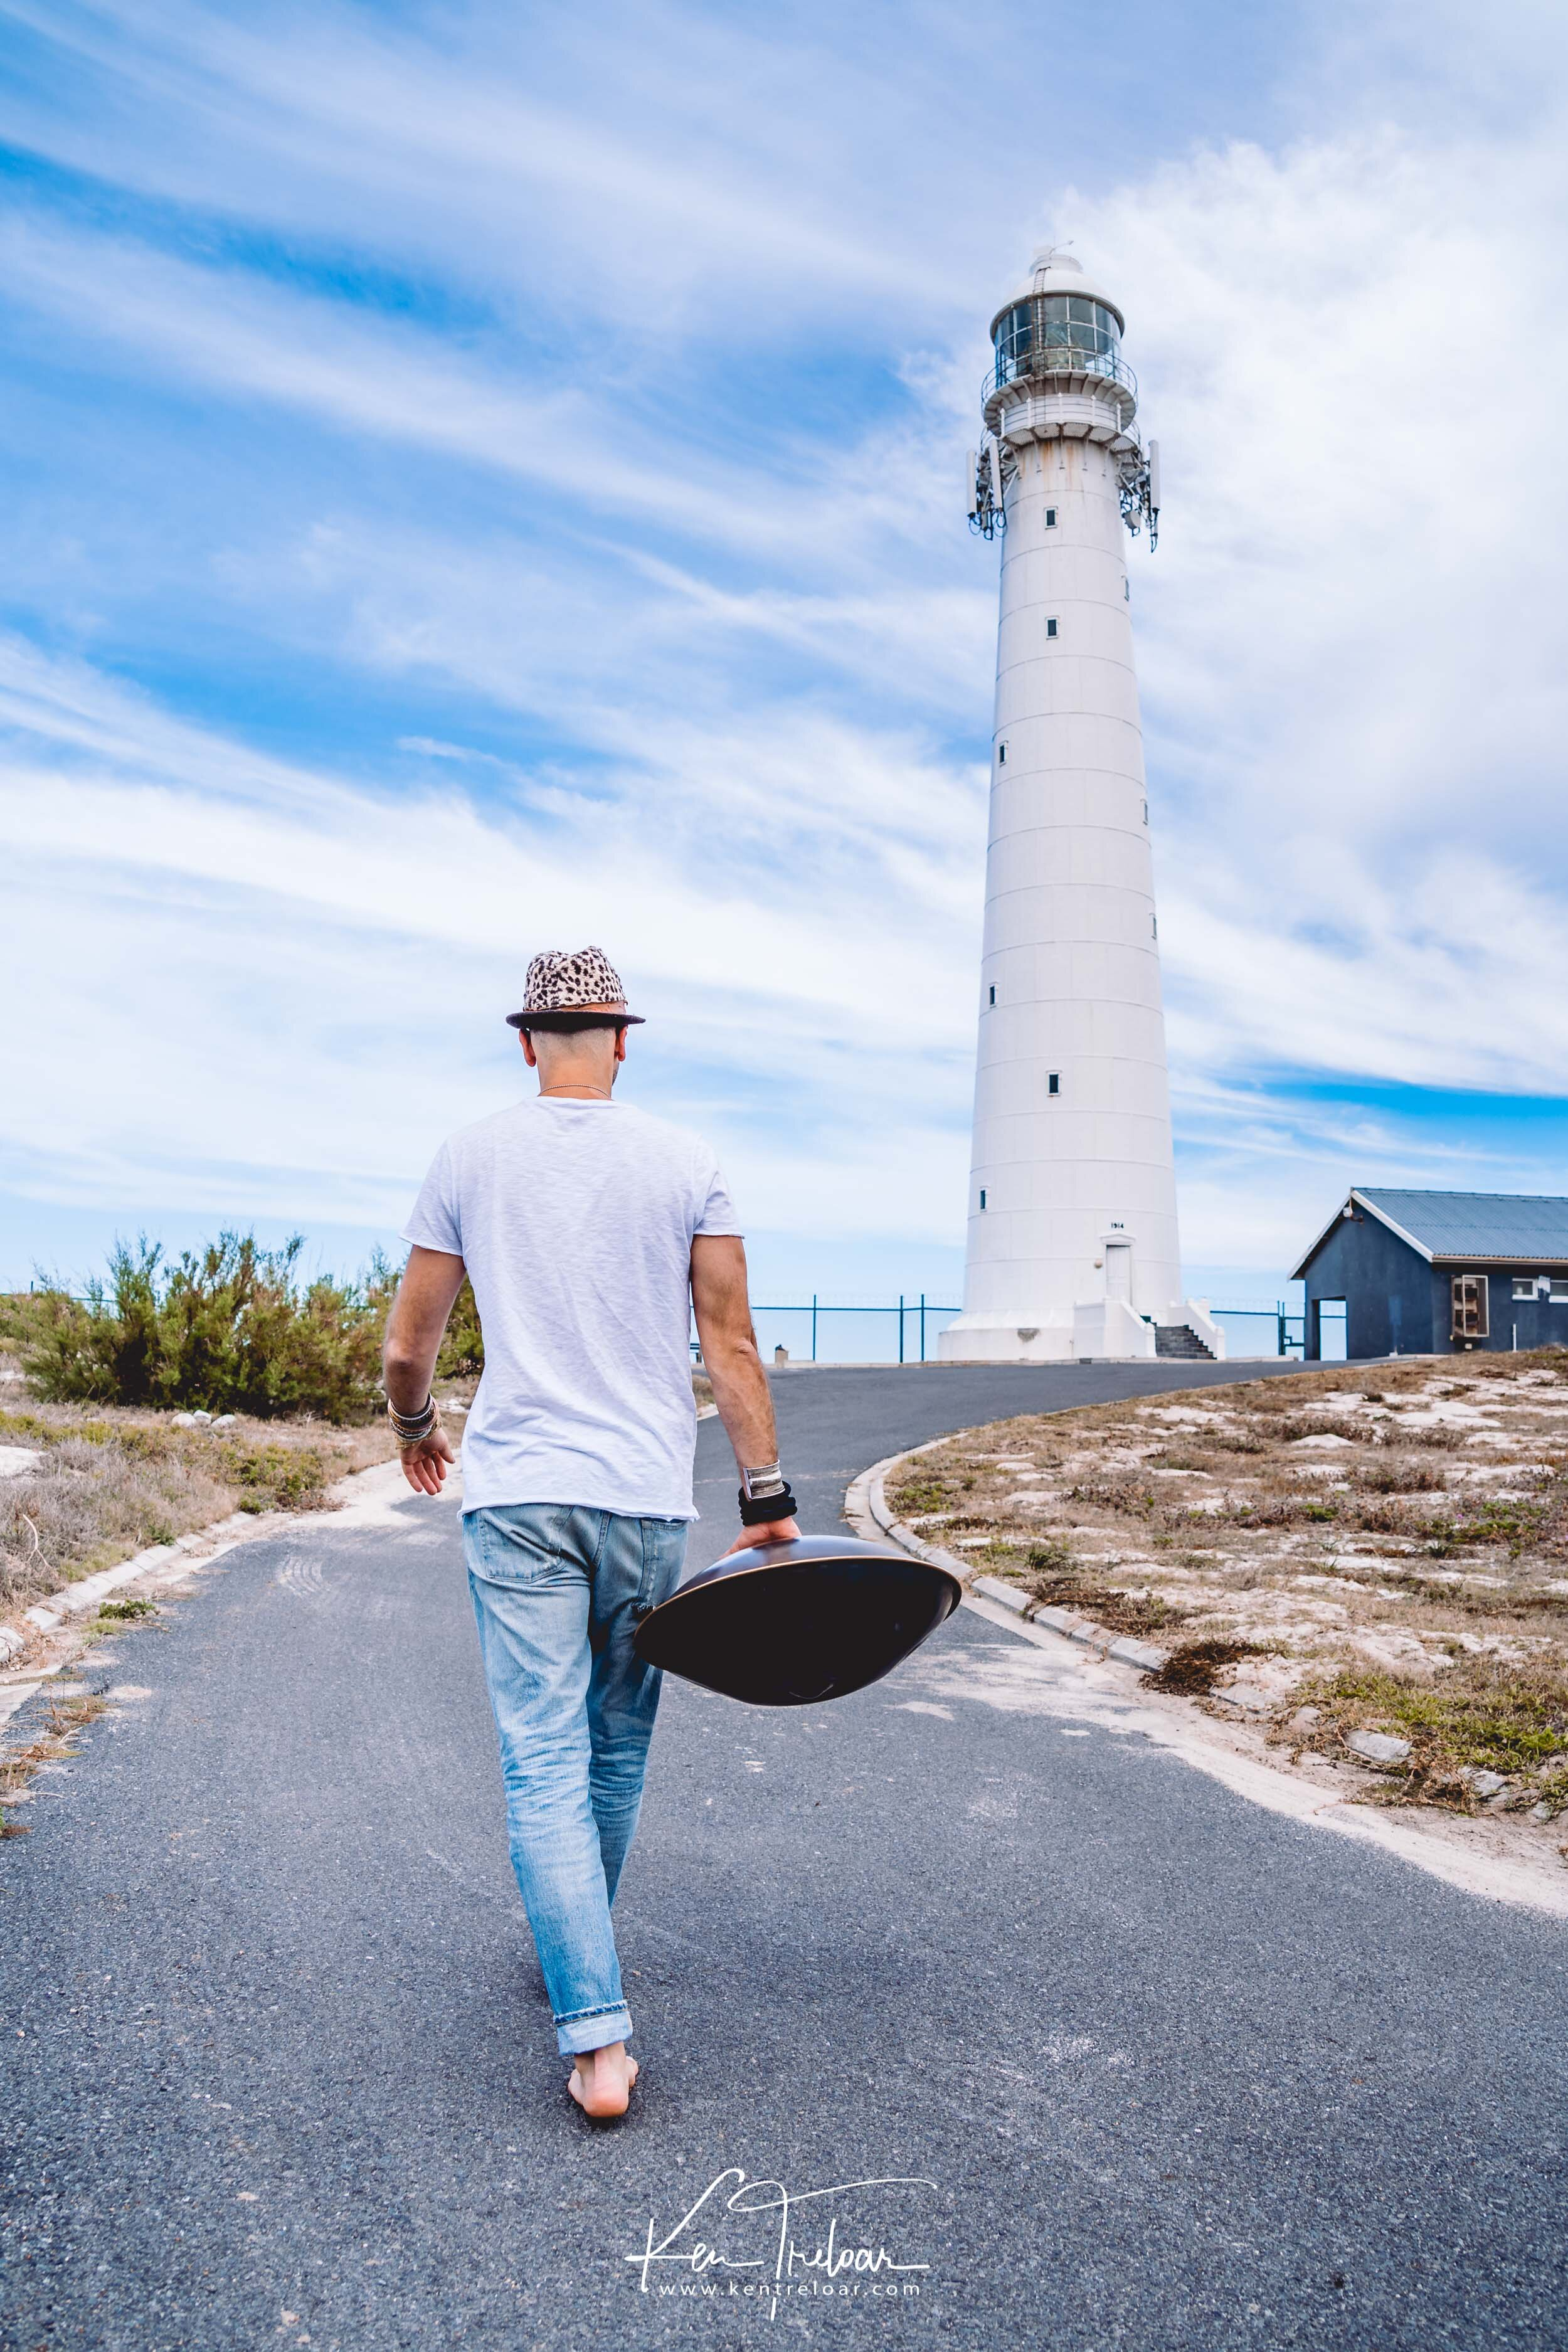 Marci Selvaggio - Hang Instrument Cape Town Tour - South Africa - Kommetjie Slankop Lighthouse -  Image by Ken Treloar-5.jpg